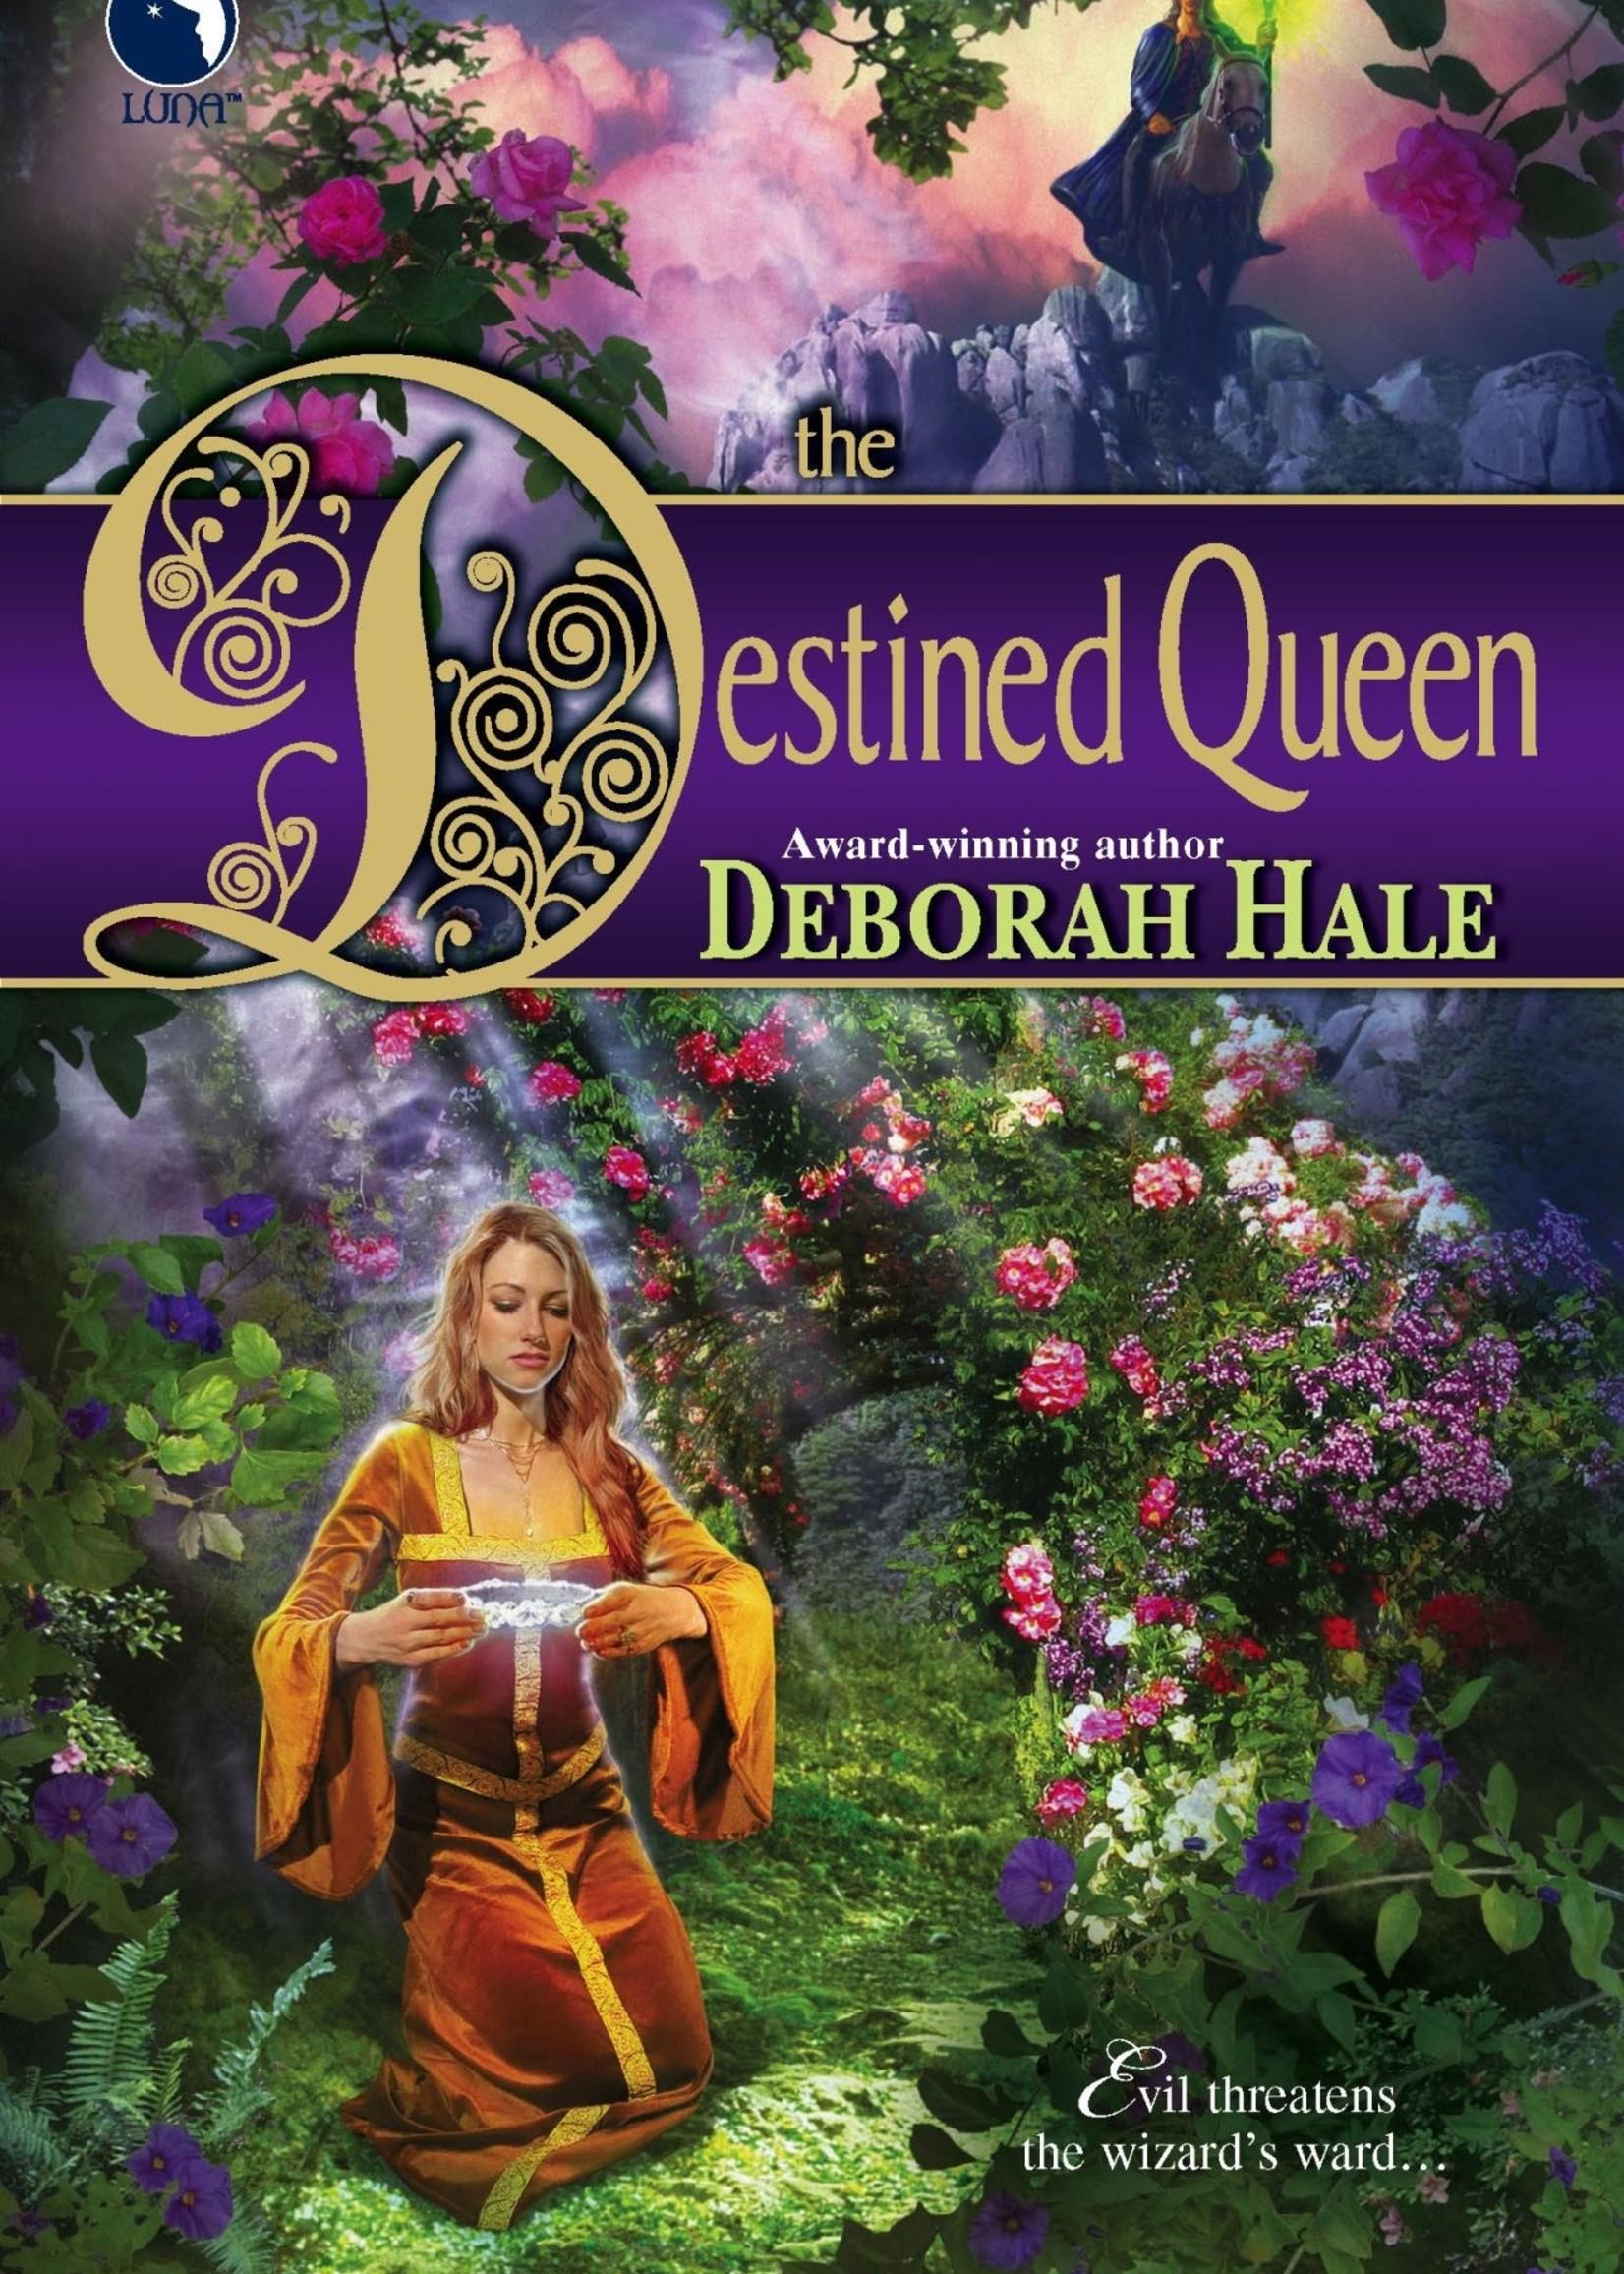 The Destined Queen by Deborah Hale